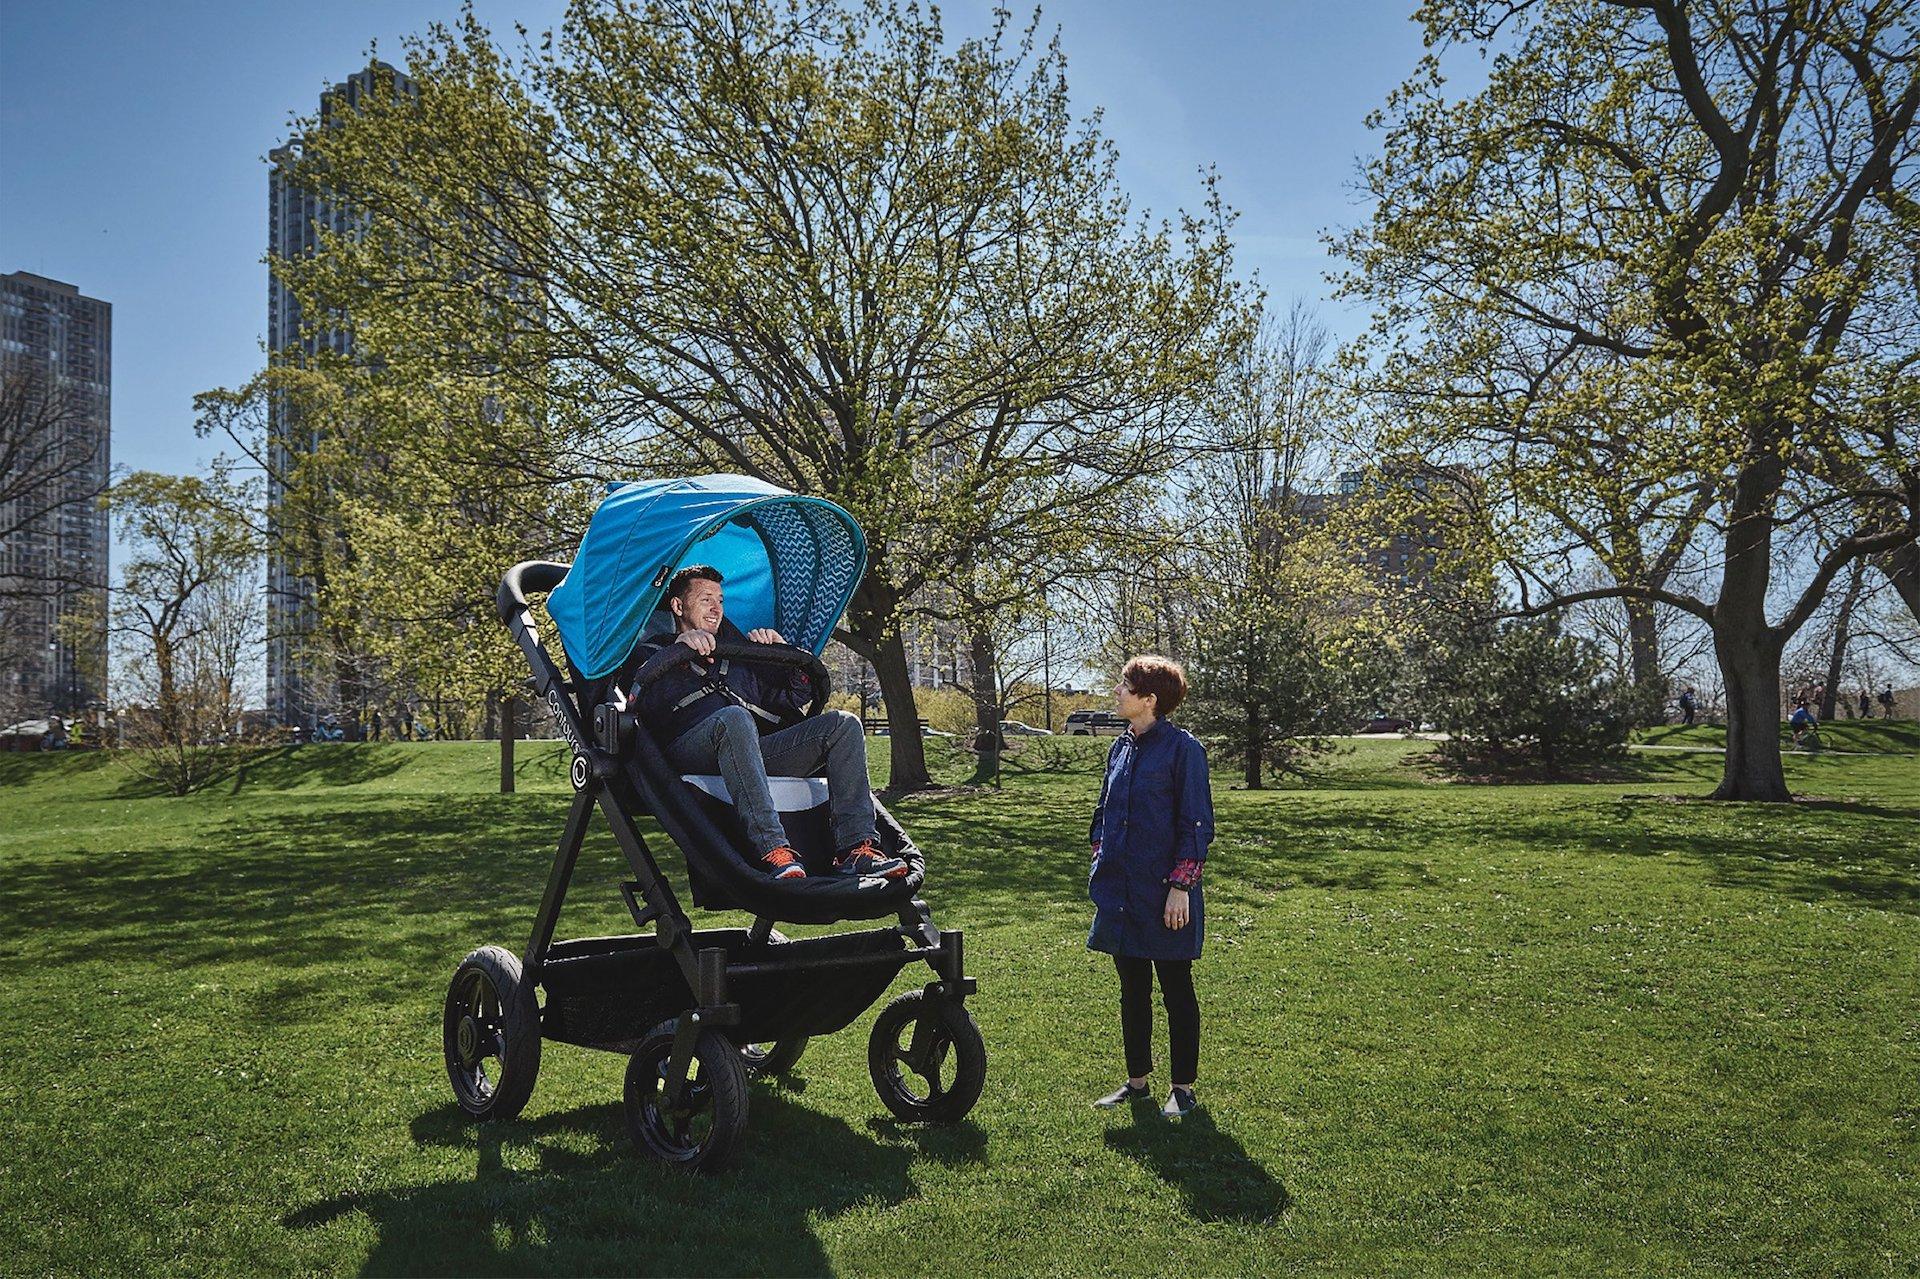 baby-stroller-test-ride.jpg